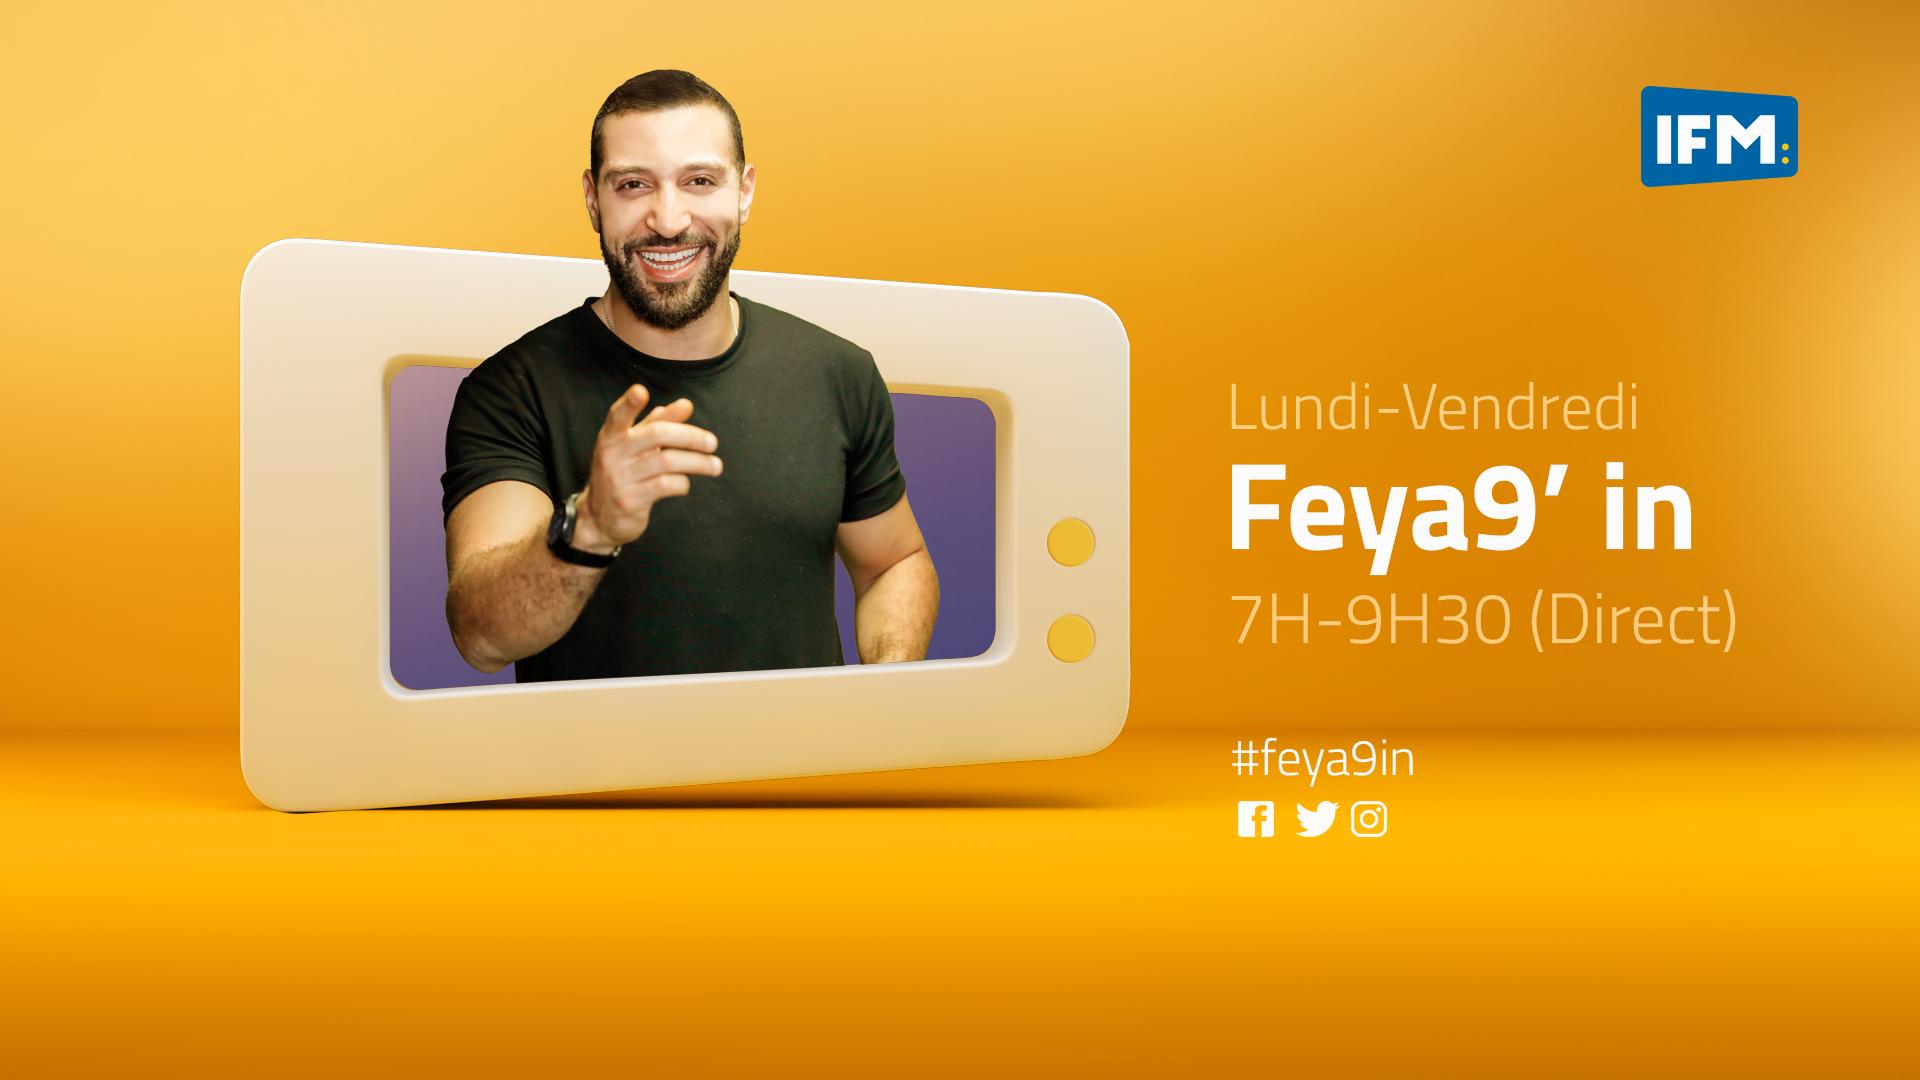 Feya9.in Le 07-10-2021 Feya9'in